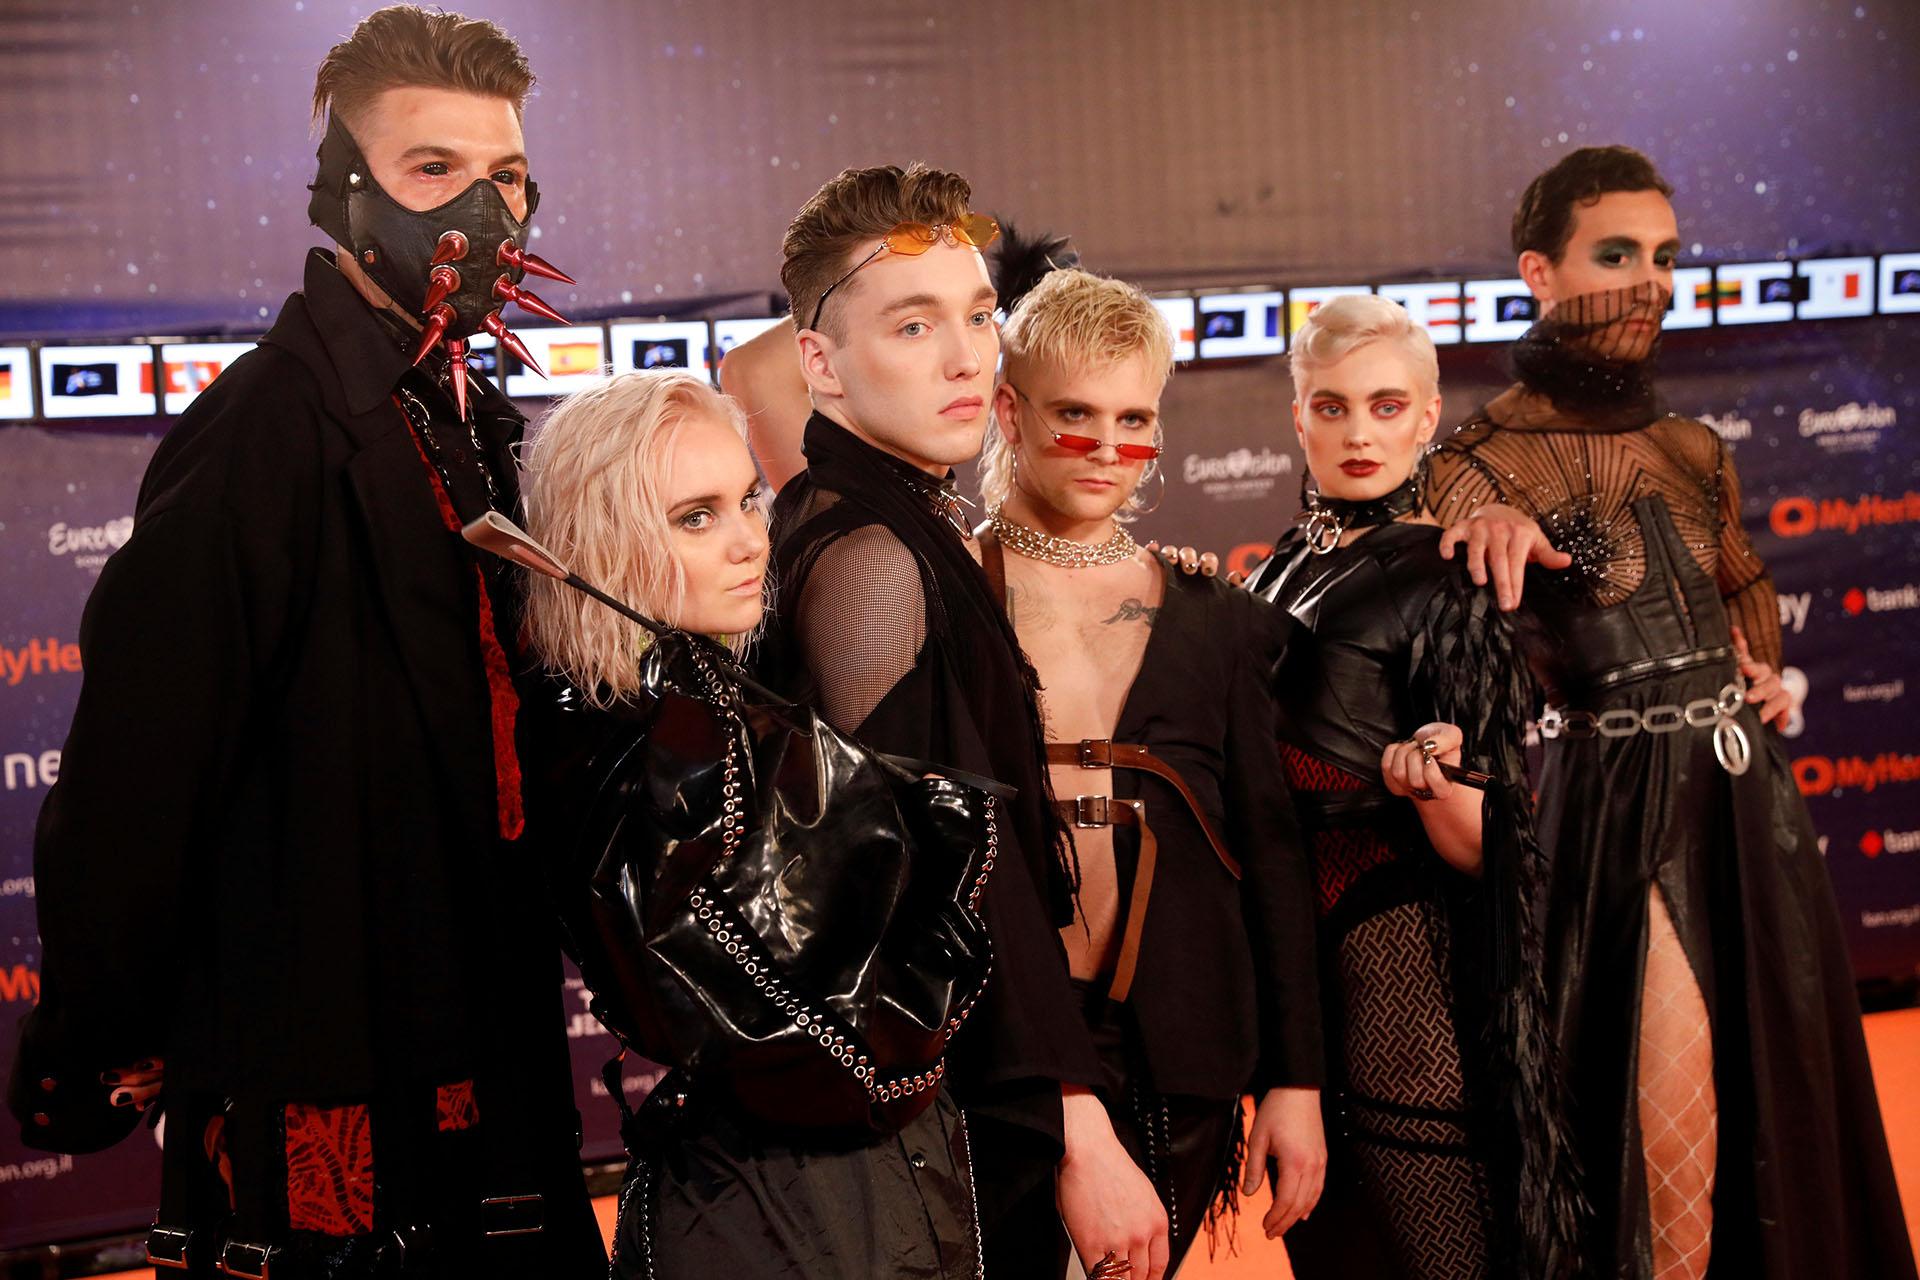 El grupo Hatari, de Islandia